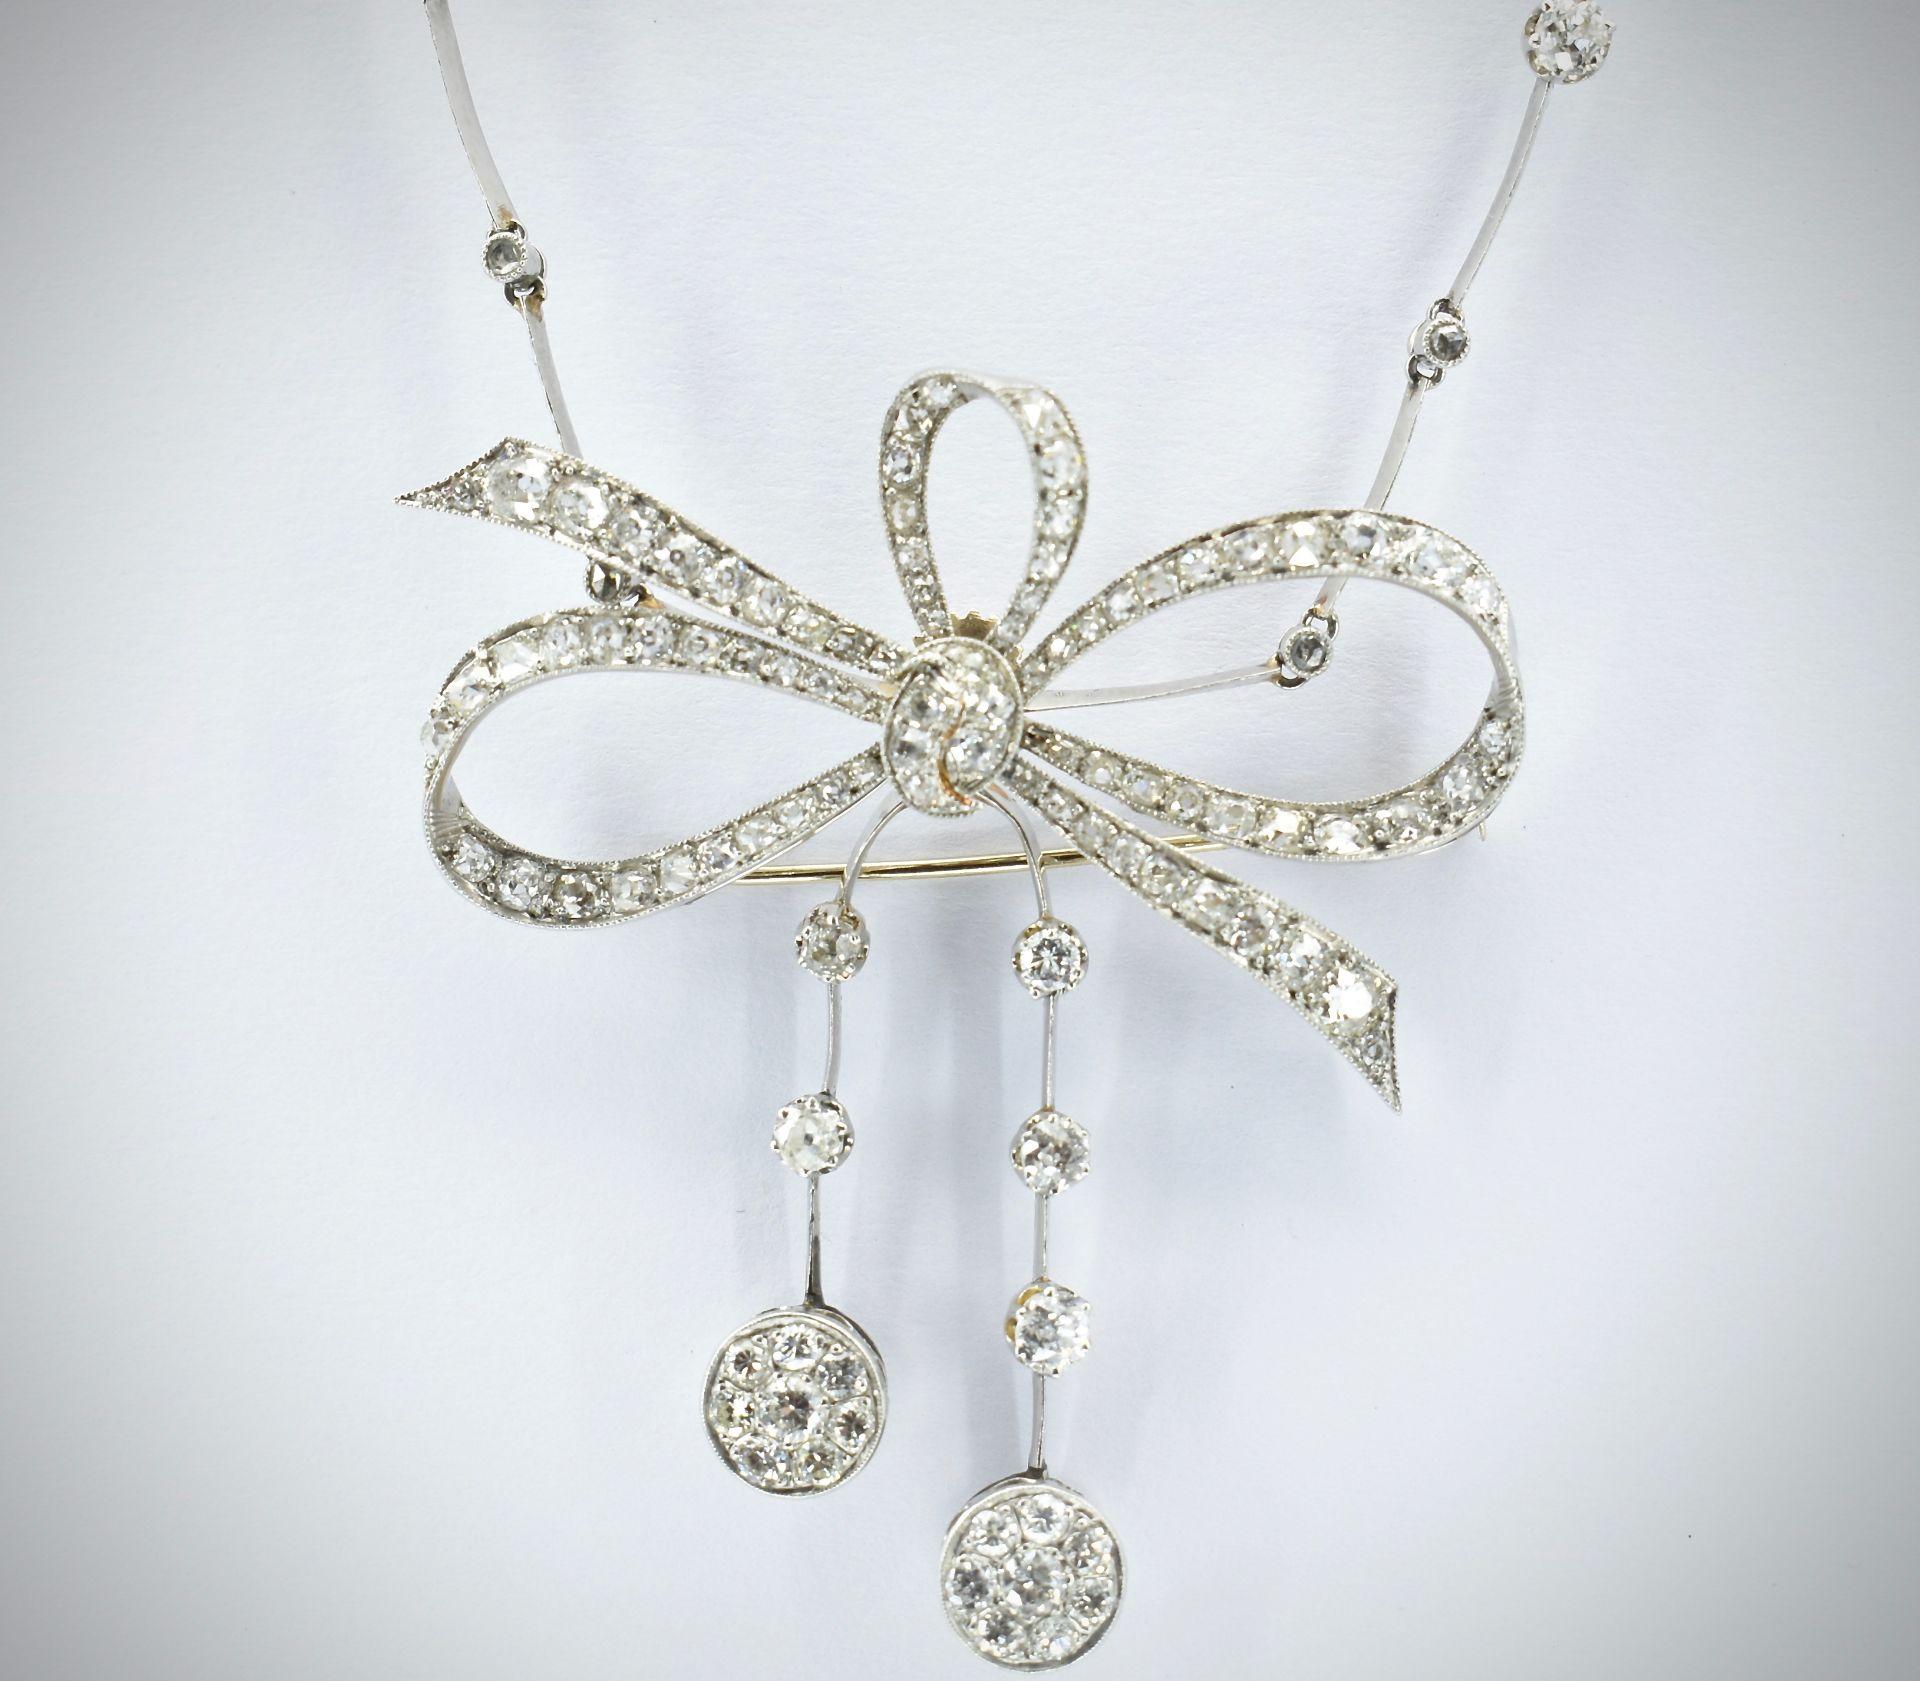 French 18ct Gold Platinum & Diamond Collar Necklace